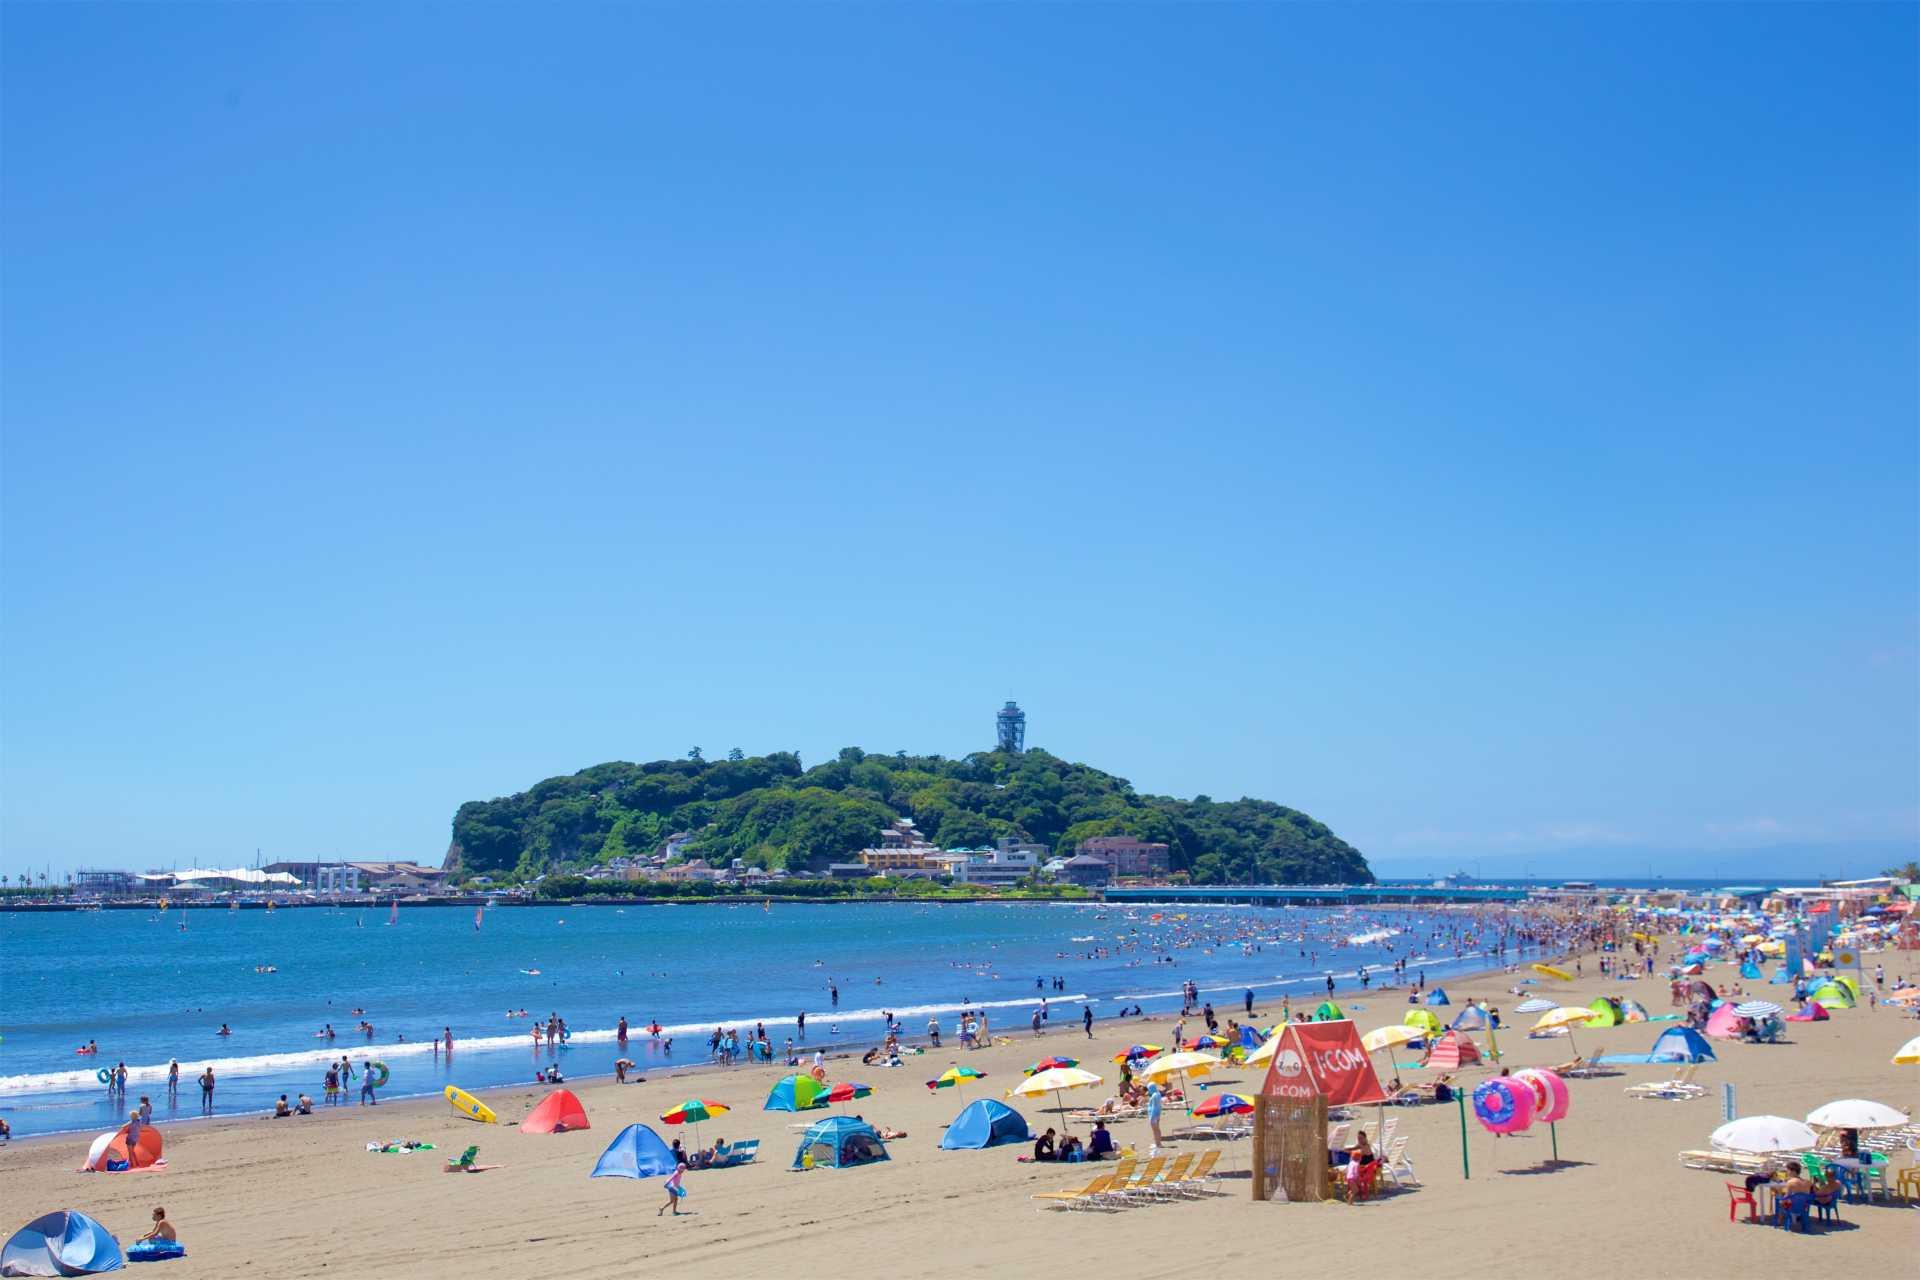 藤沢市海水浴場特設サイト